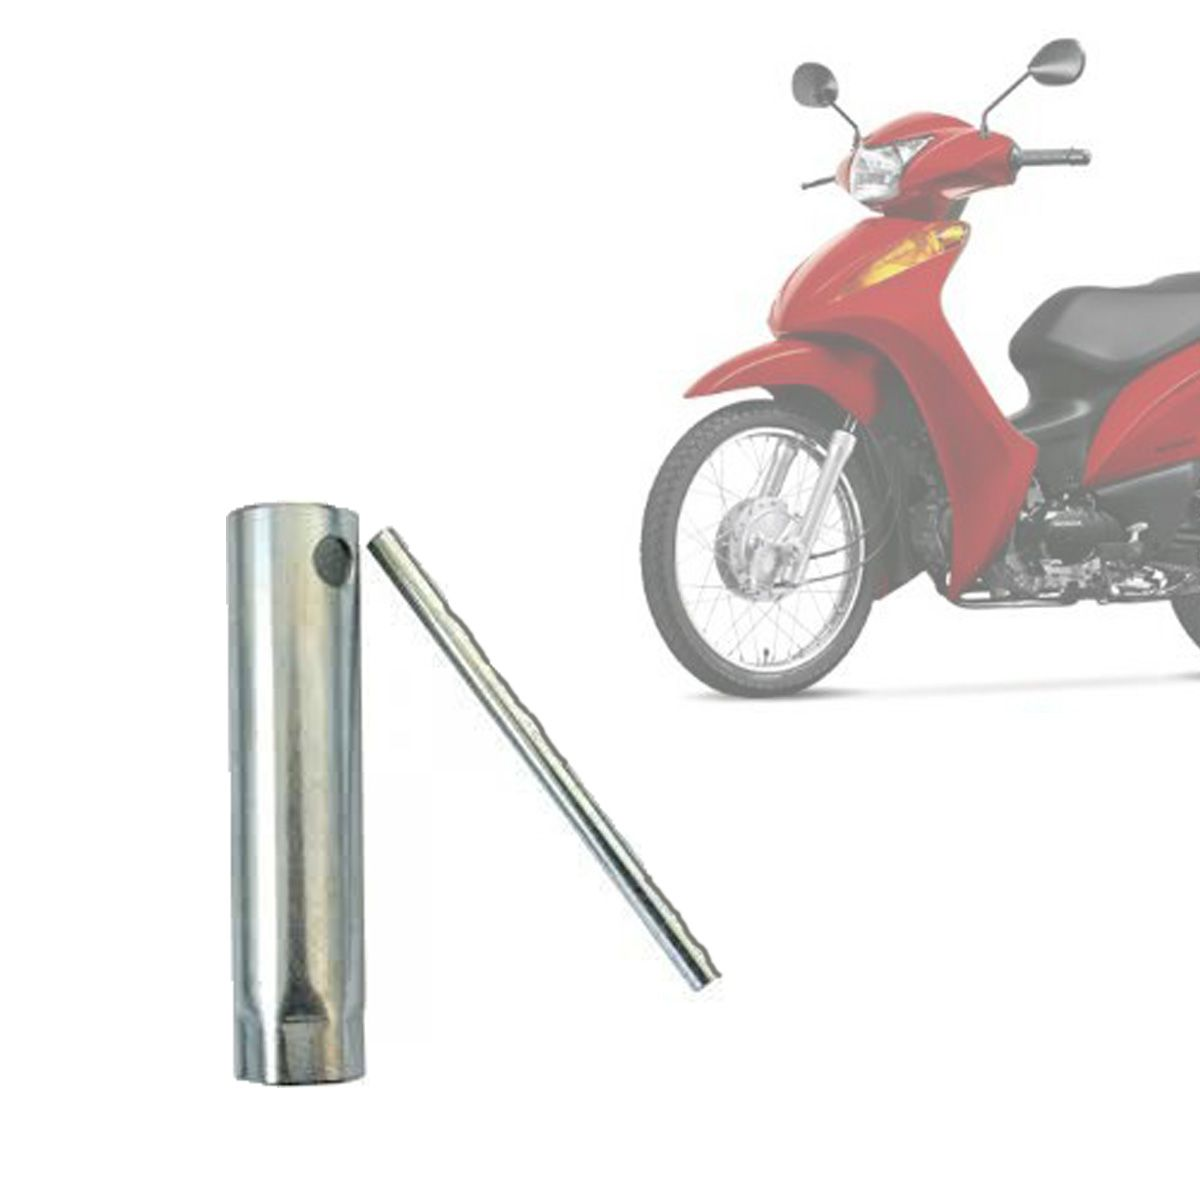 Chave de Vela Honda C 100 Biz Pop/Titan/Fan/Bros, Yamaha YBR Factor Fazer - Galvanizada - Pro Tork